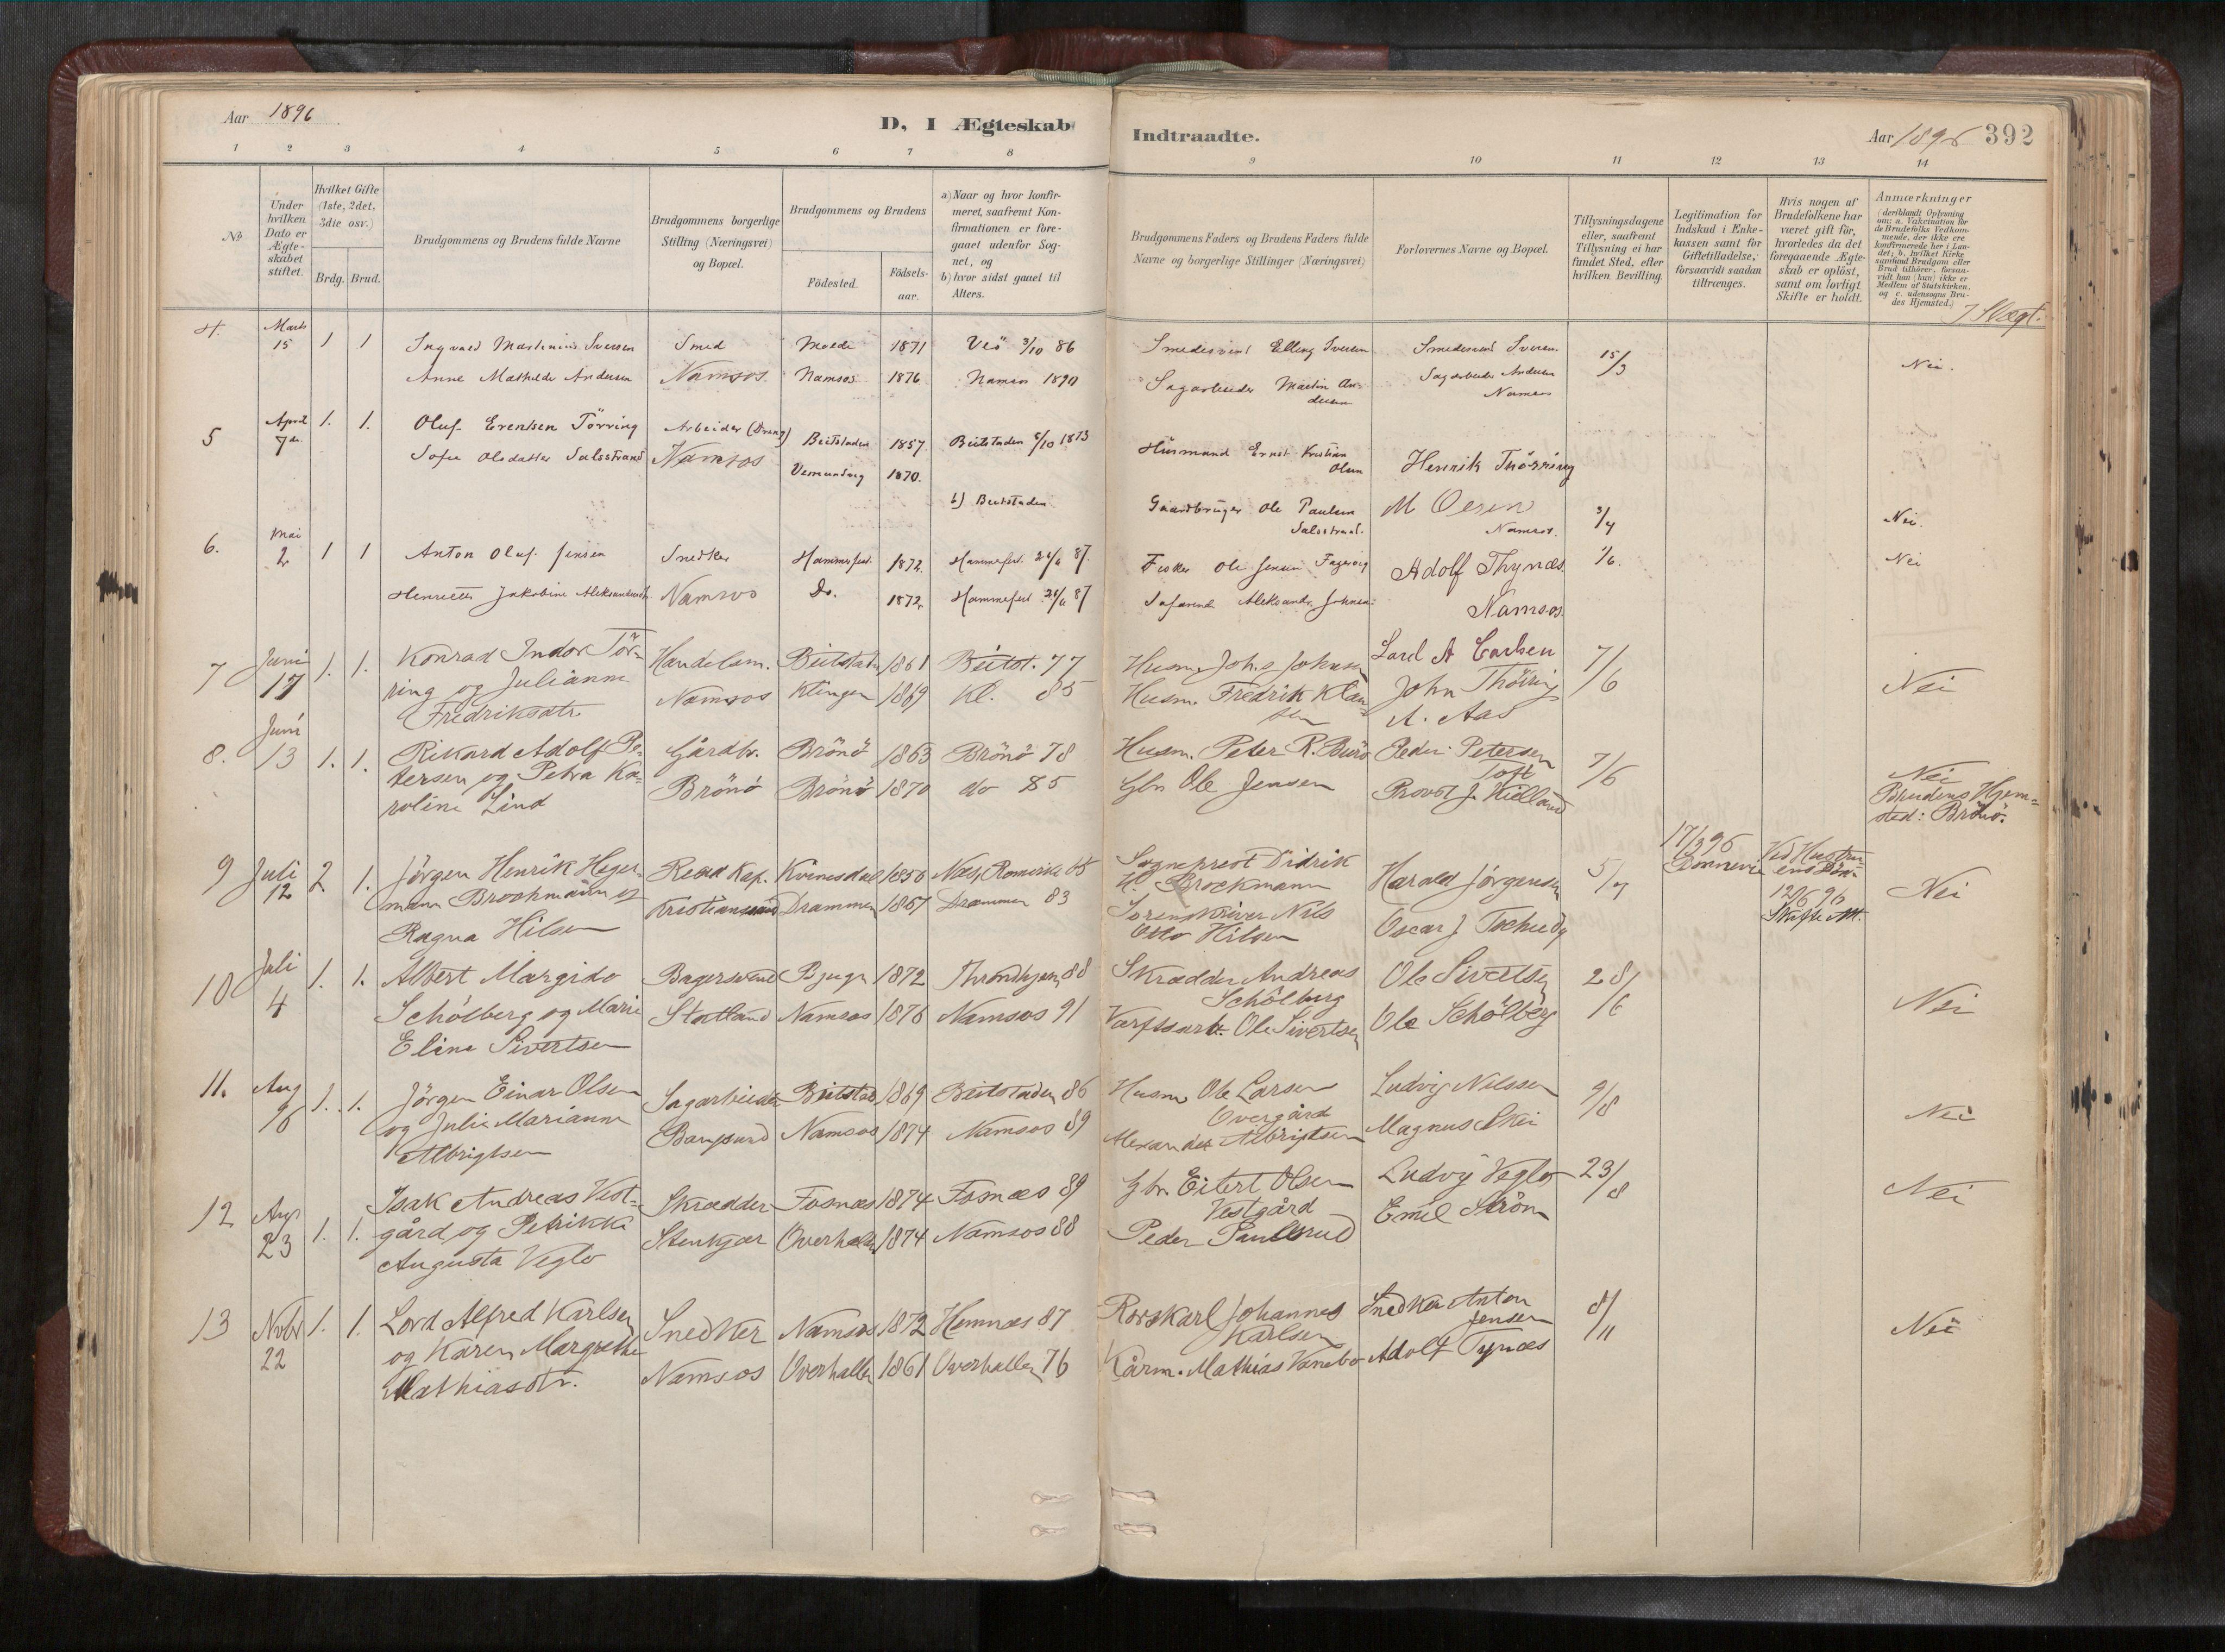 SAT, Ministerialprotokoller, klokkerbøker og fødselsregistre - Nord-Trøndelag, 768/L0579a: Ministerialbok nr. 768A14, 1887-1931, s. 392